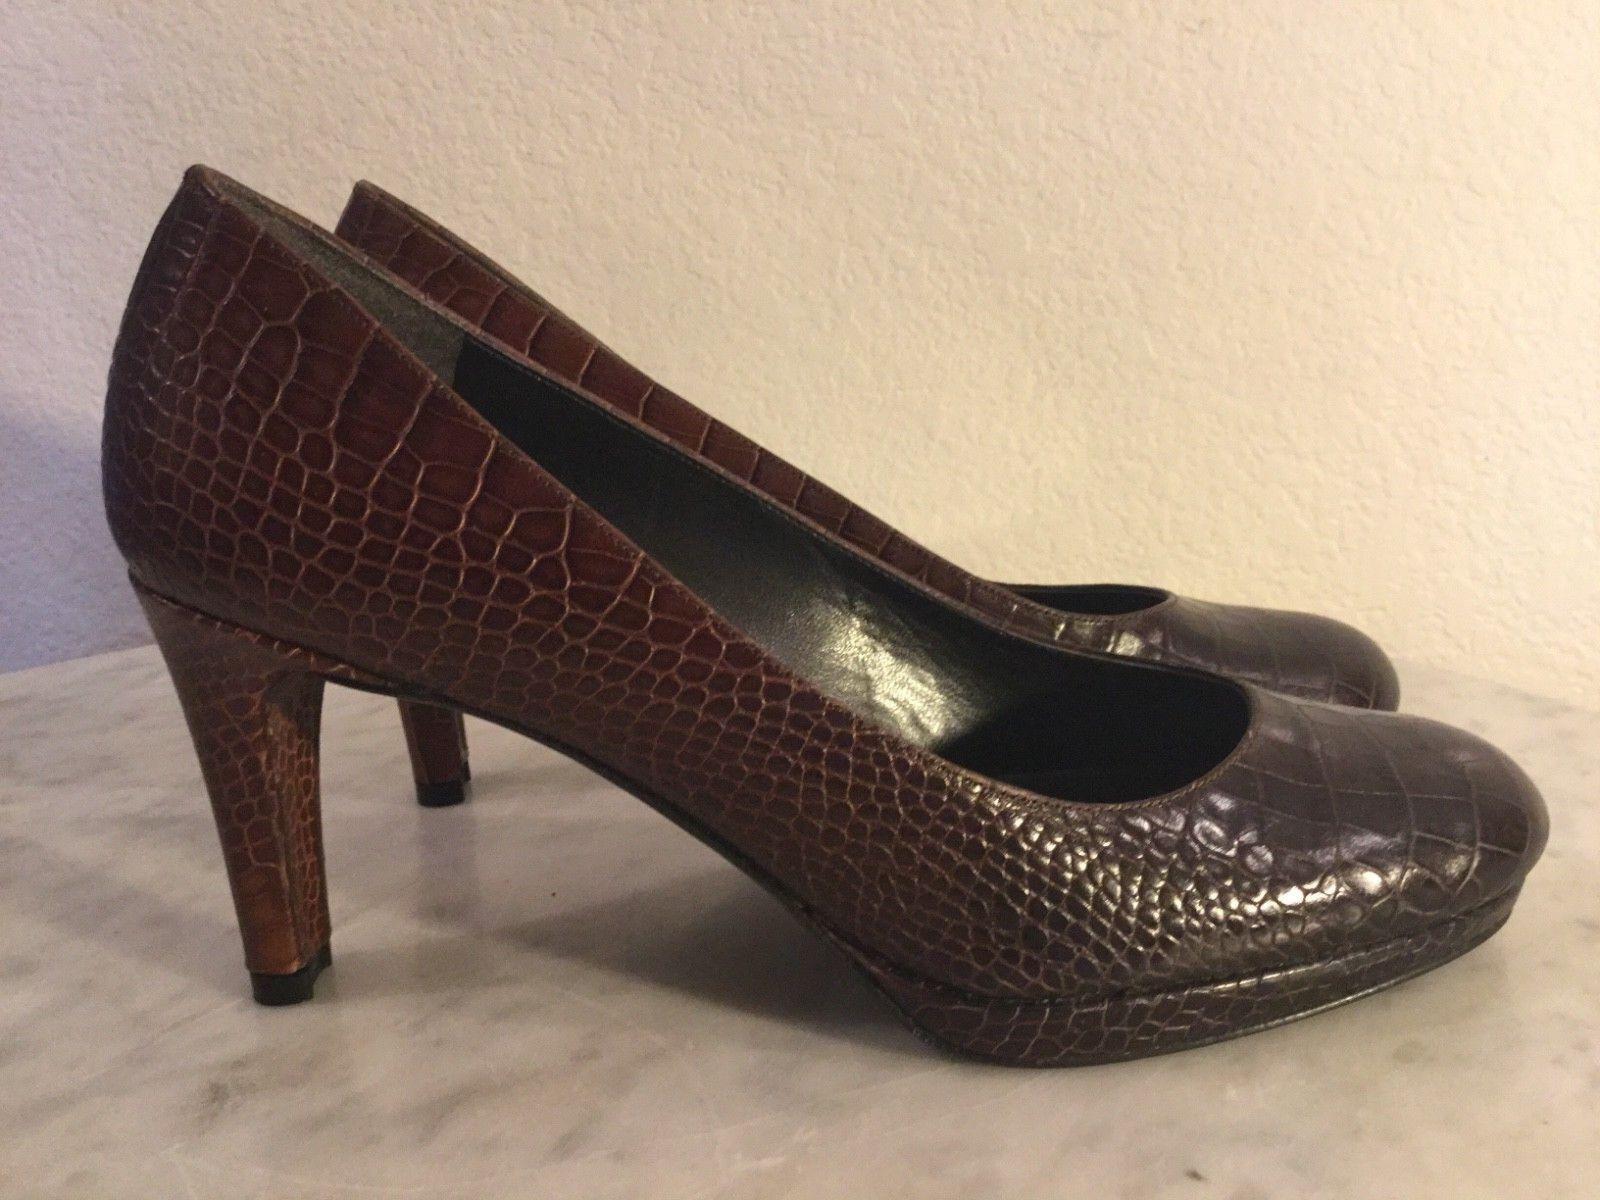 per offrirti un piacevole shopping online STUART WEITZMAN  Blog  Marrone Leather Croc Croc Croc Embossed Pump Wm Sz 7 1 2 M. Spain.  grandi offerte